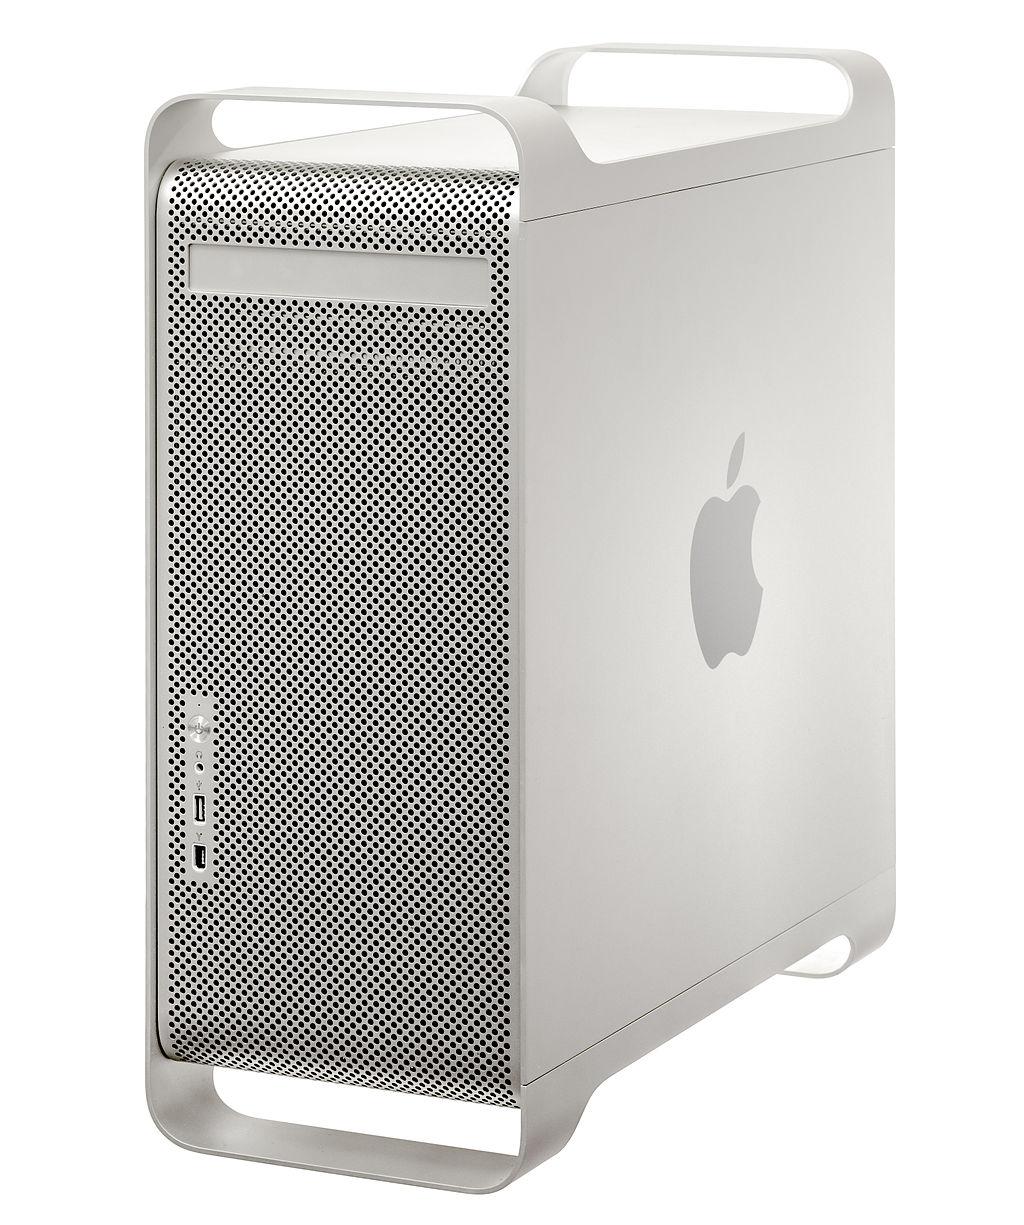 1024px-Apple_Power_Macintosh_G5_Late_2005_02